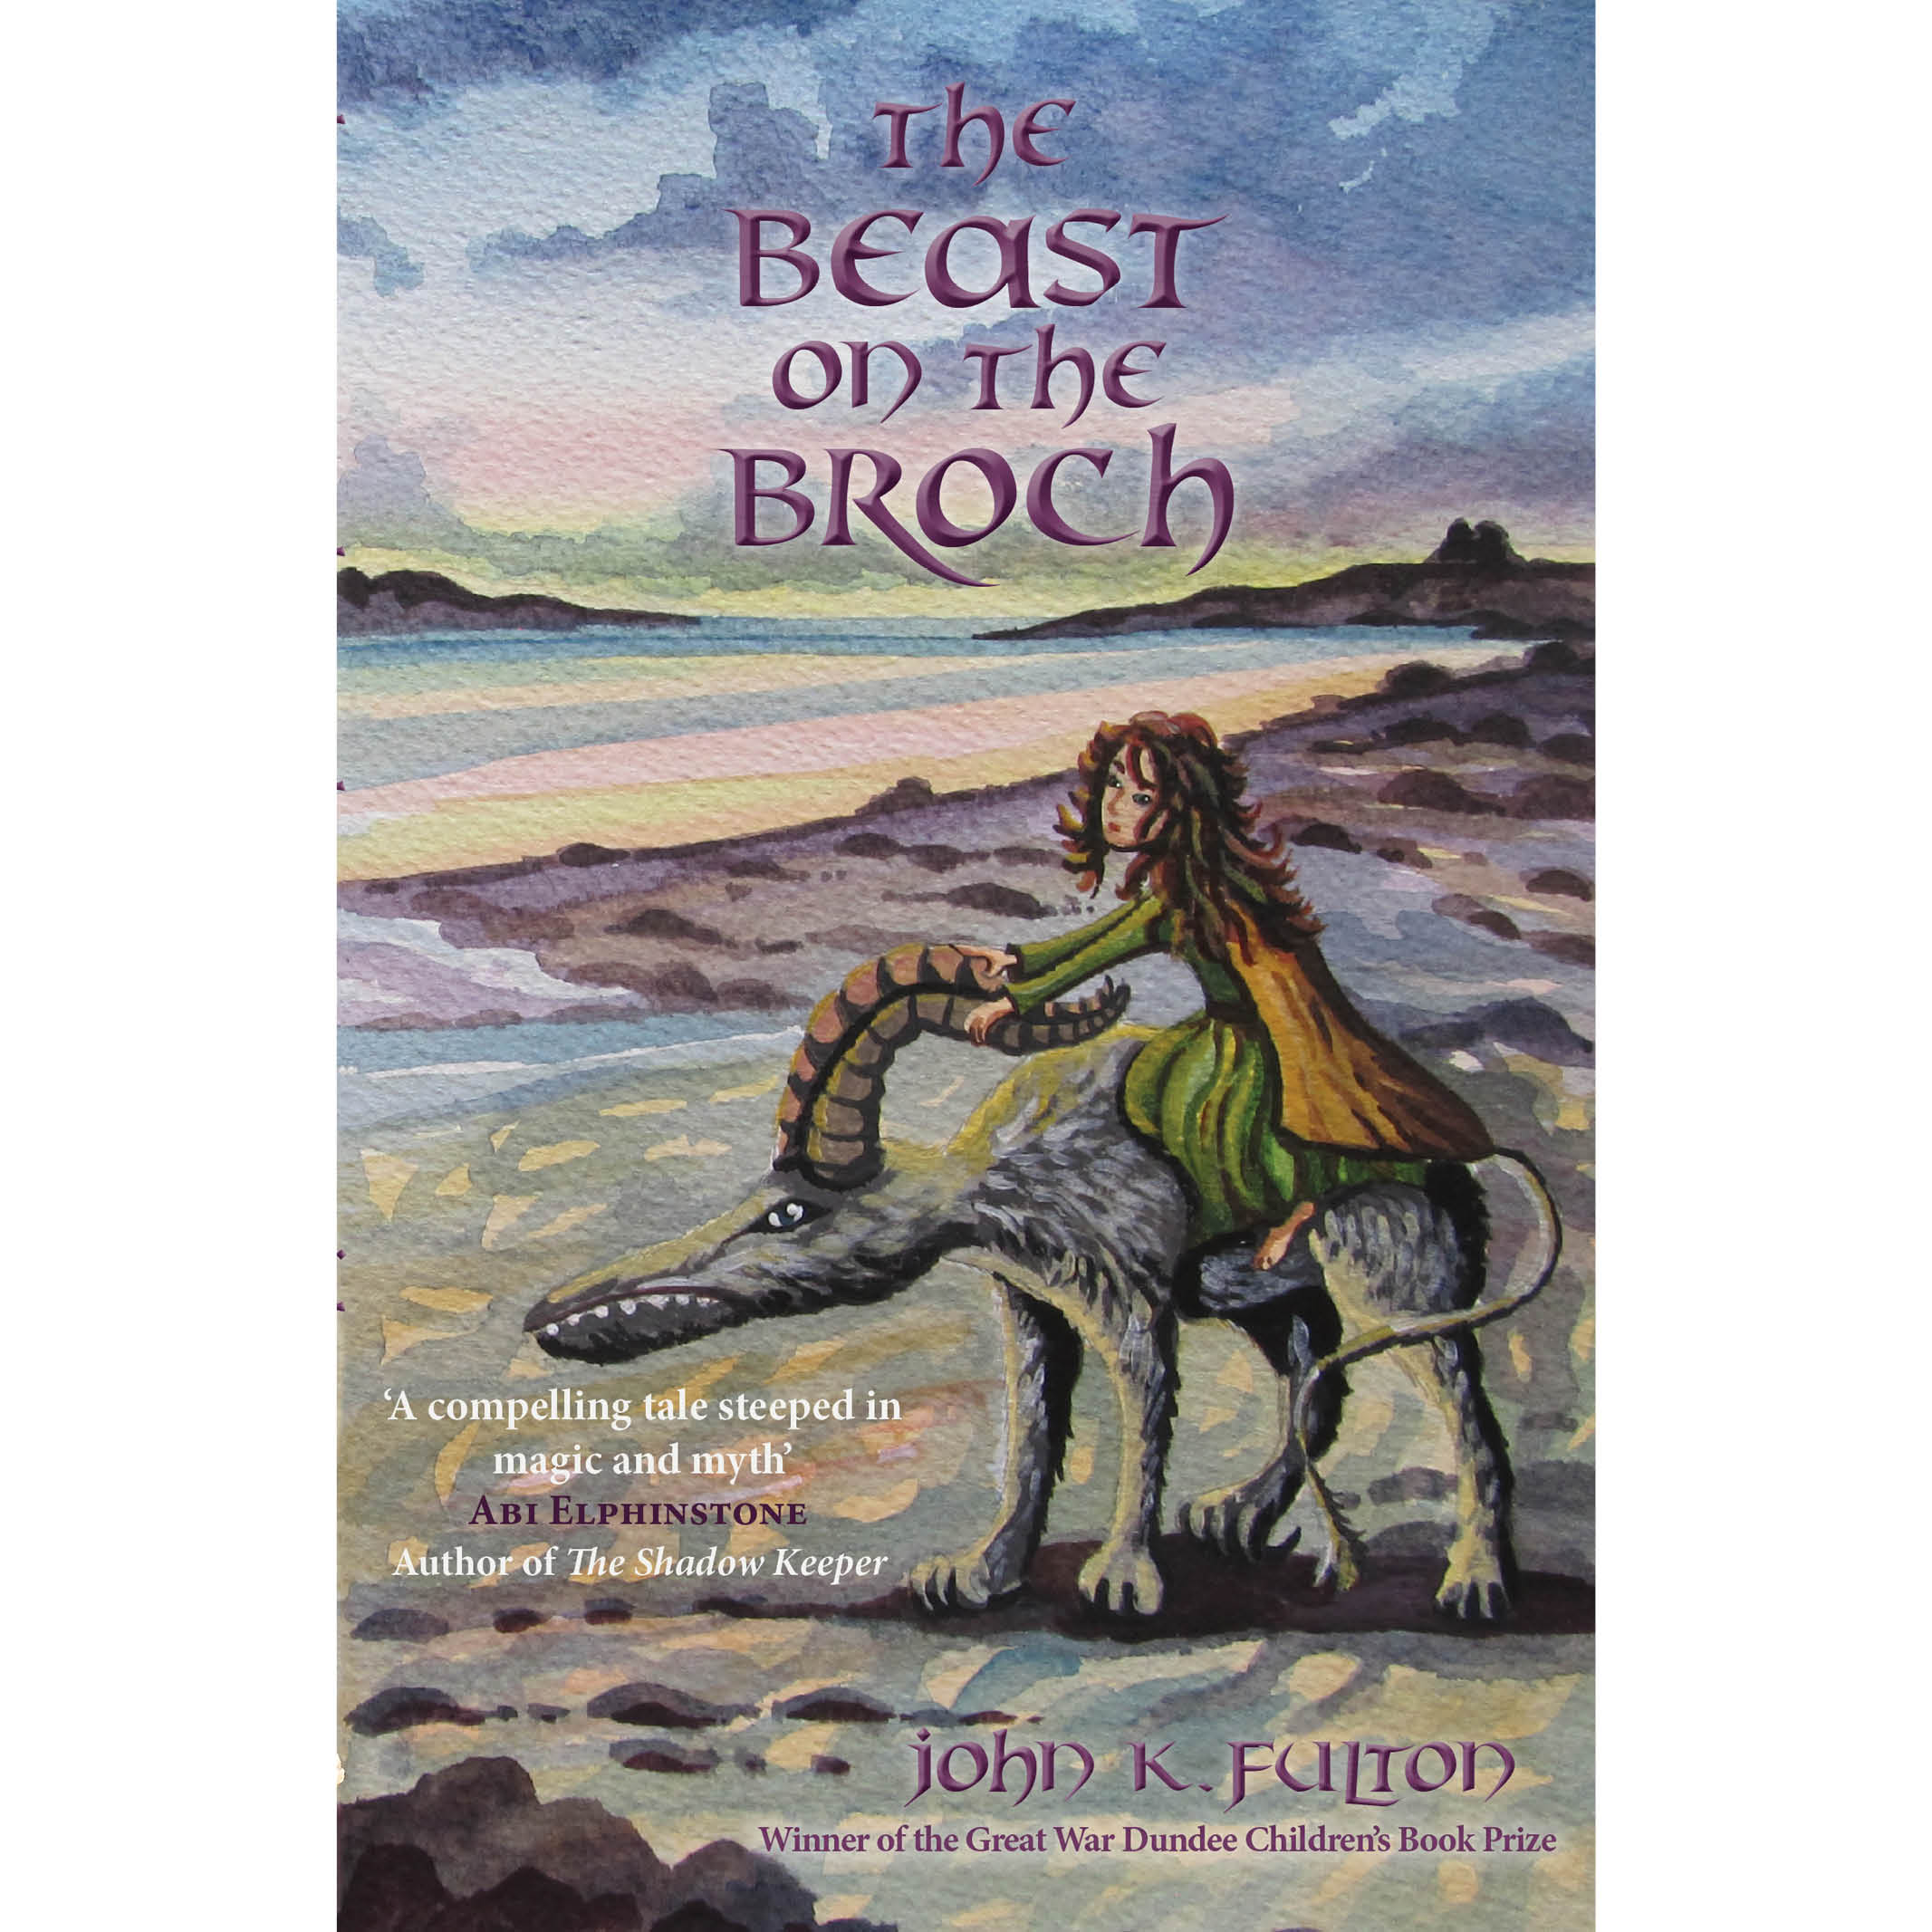 Scotland, 799 AD. Talorca befriends a strange Pictish beast; together, they fight off Viking raiders.